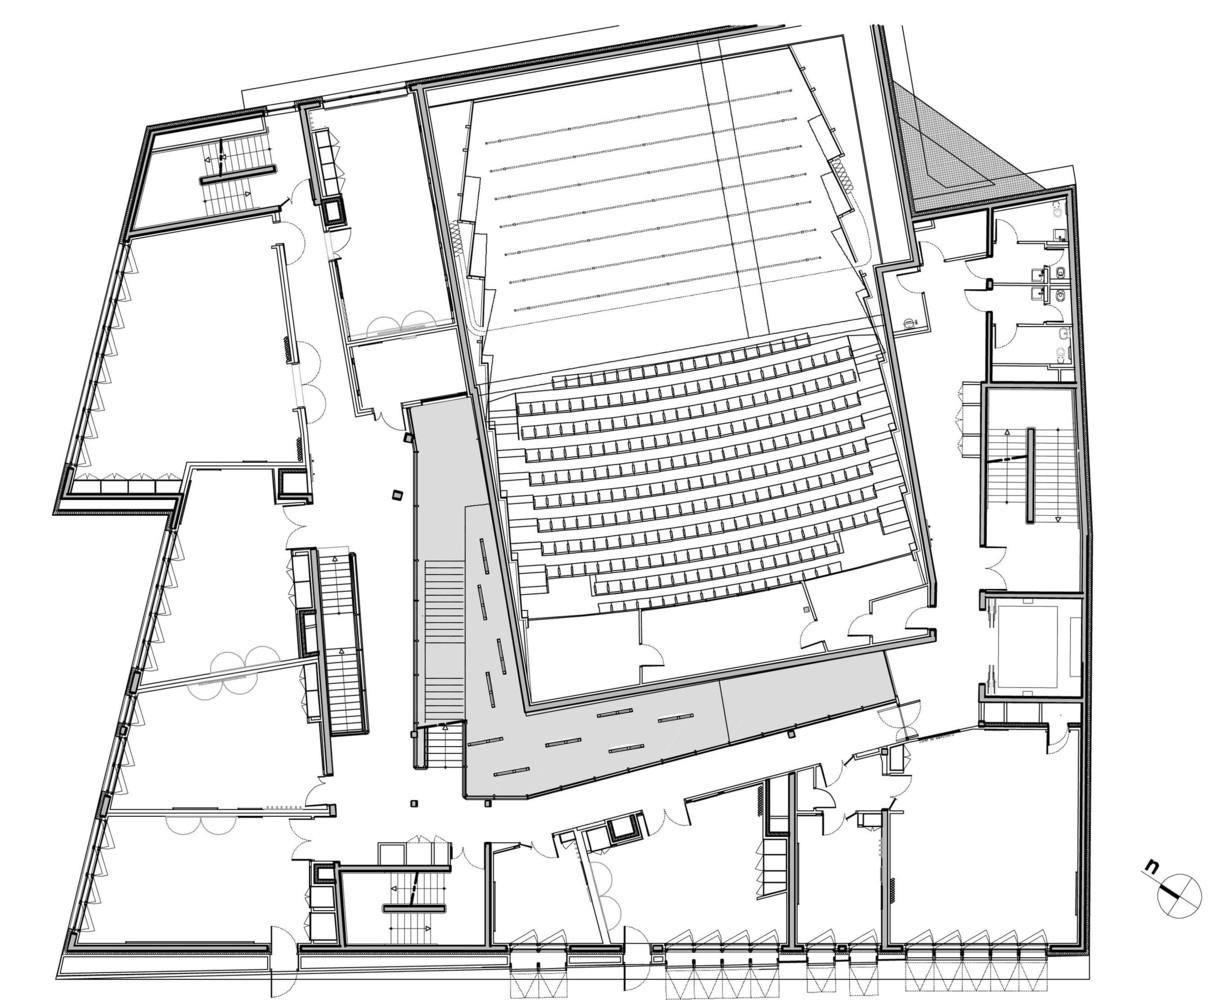 Gallery Of Music Conservatory In Paris 17th Arrondissement Basalt Architecture 25